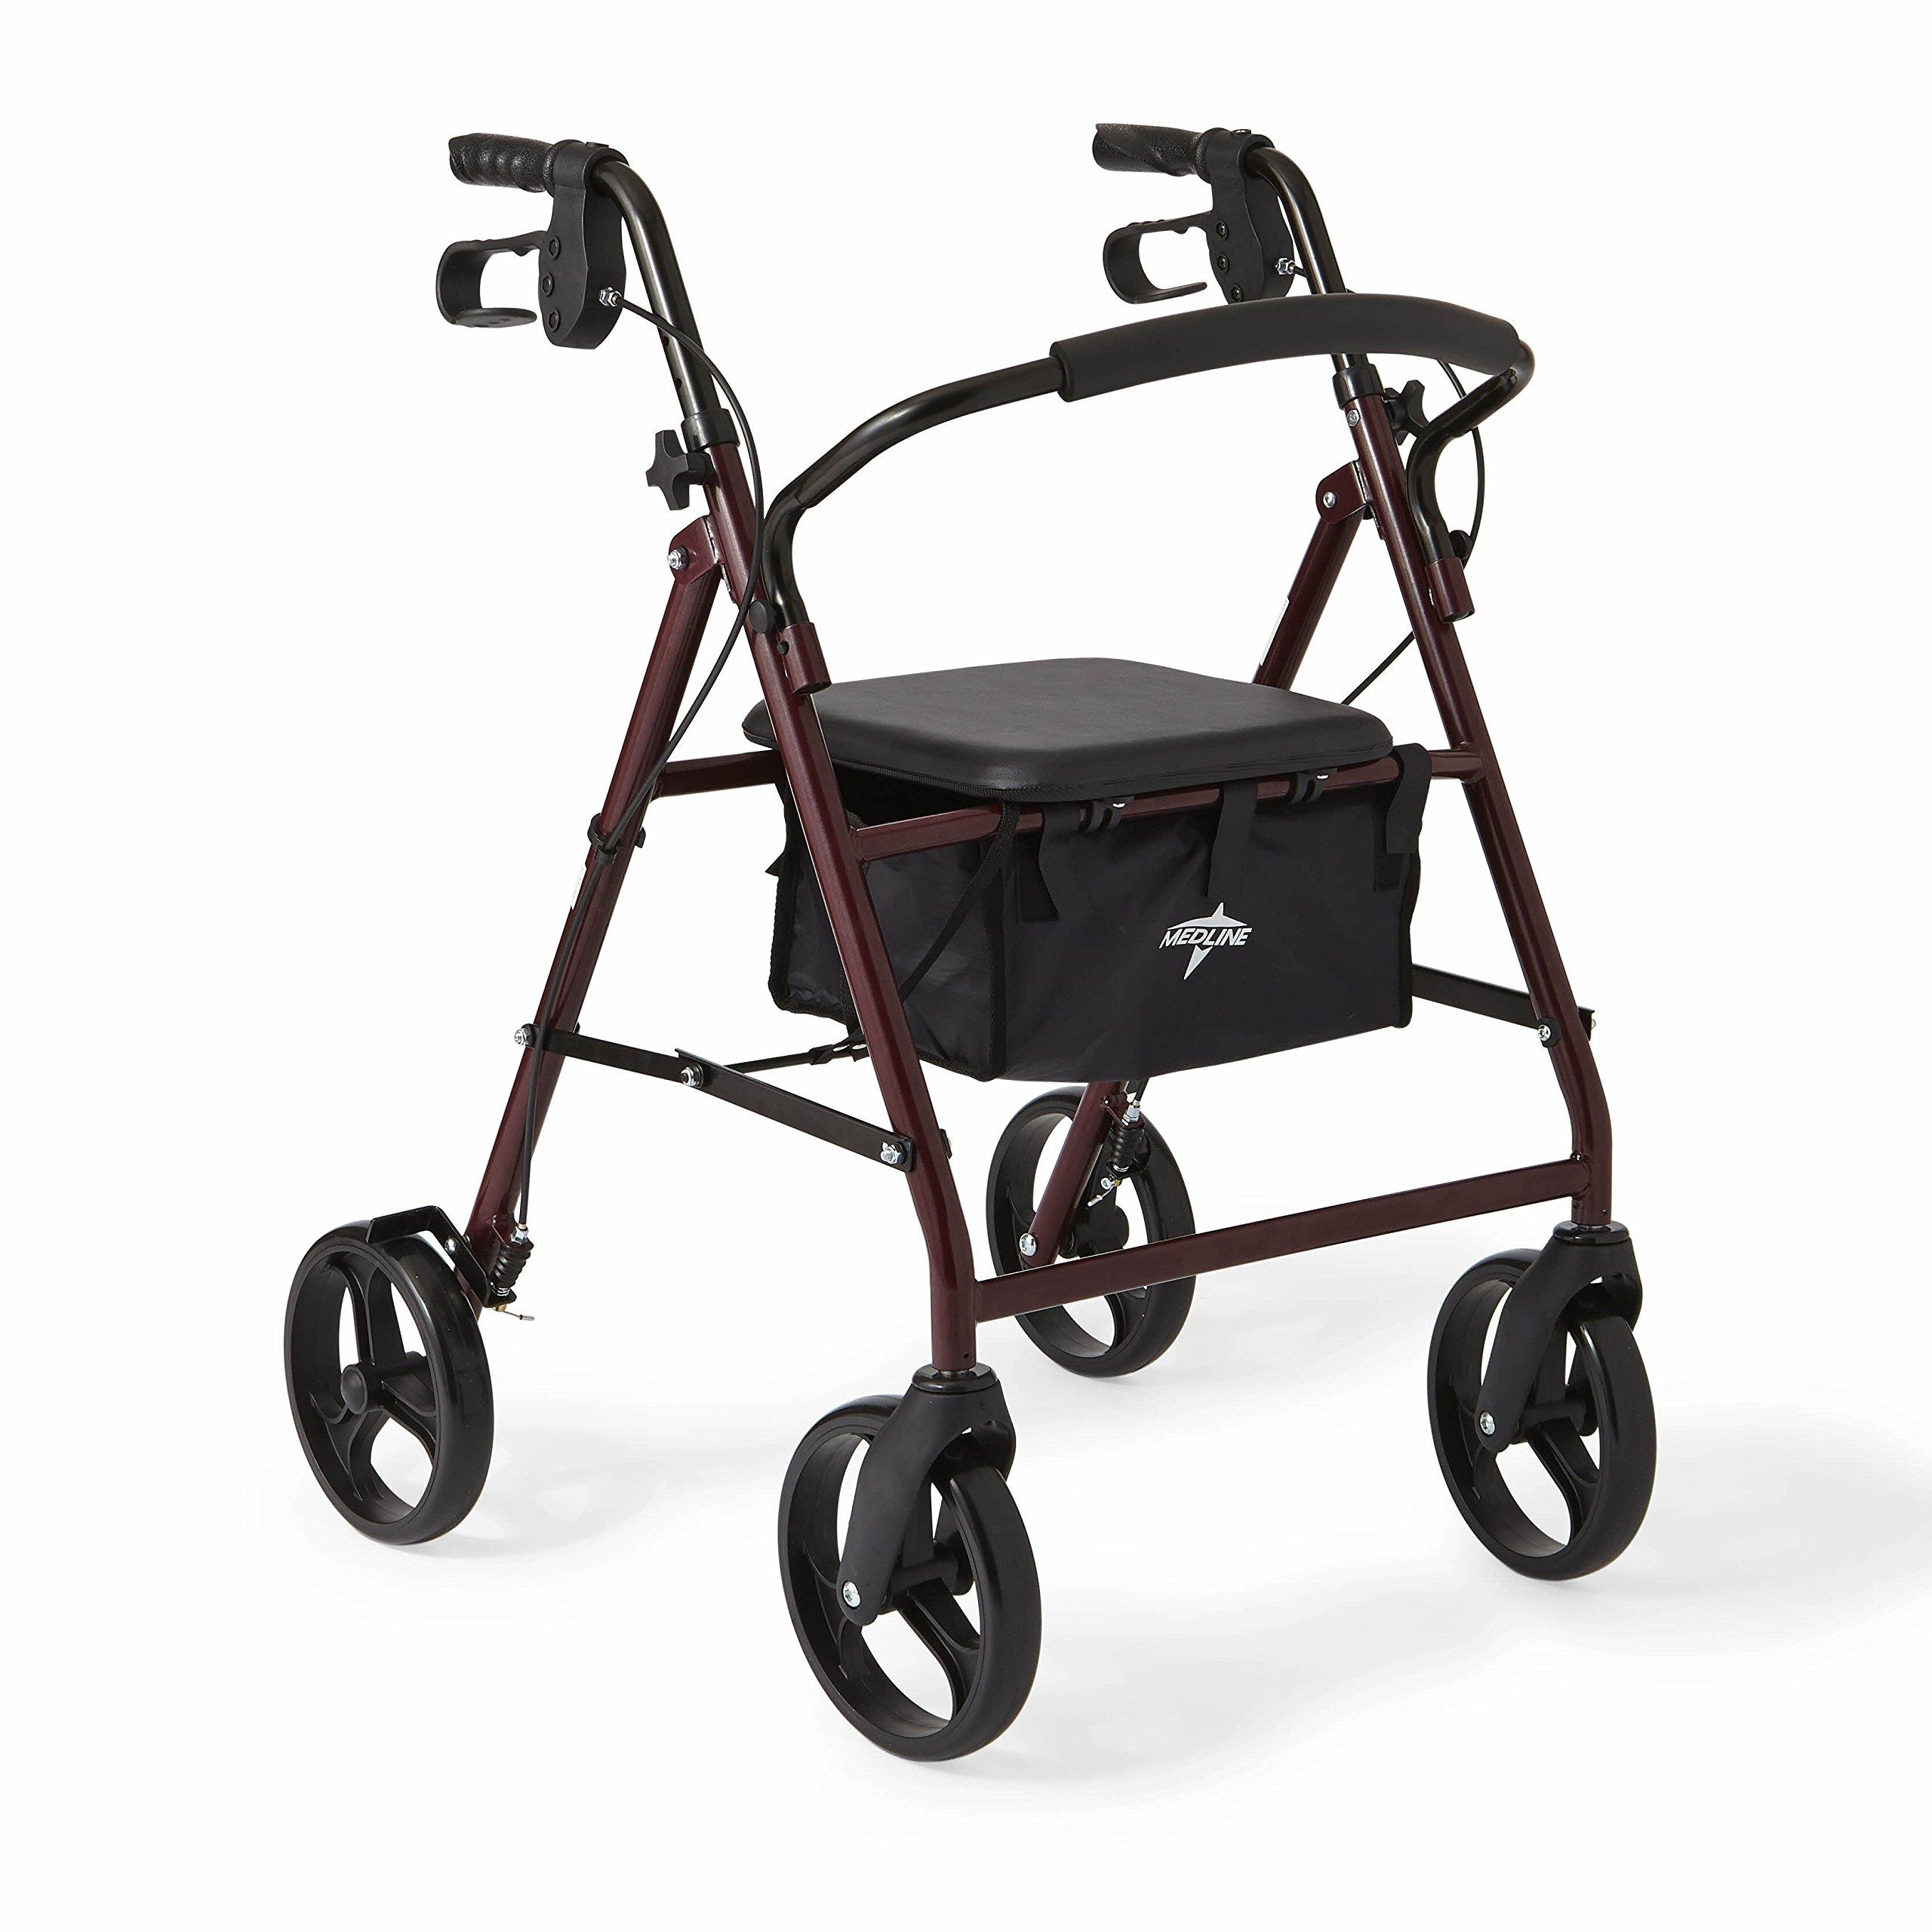 Medline Standard Adult Steel Folding Rollator Walker Aid with 8 Inch Wheels, Burgundy